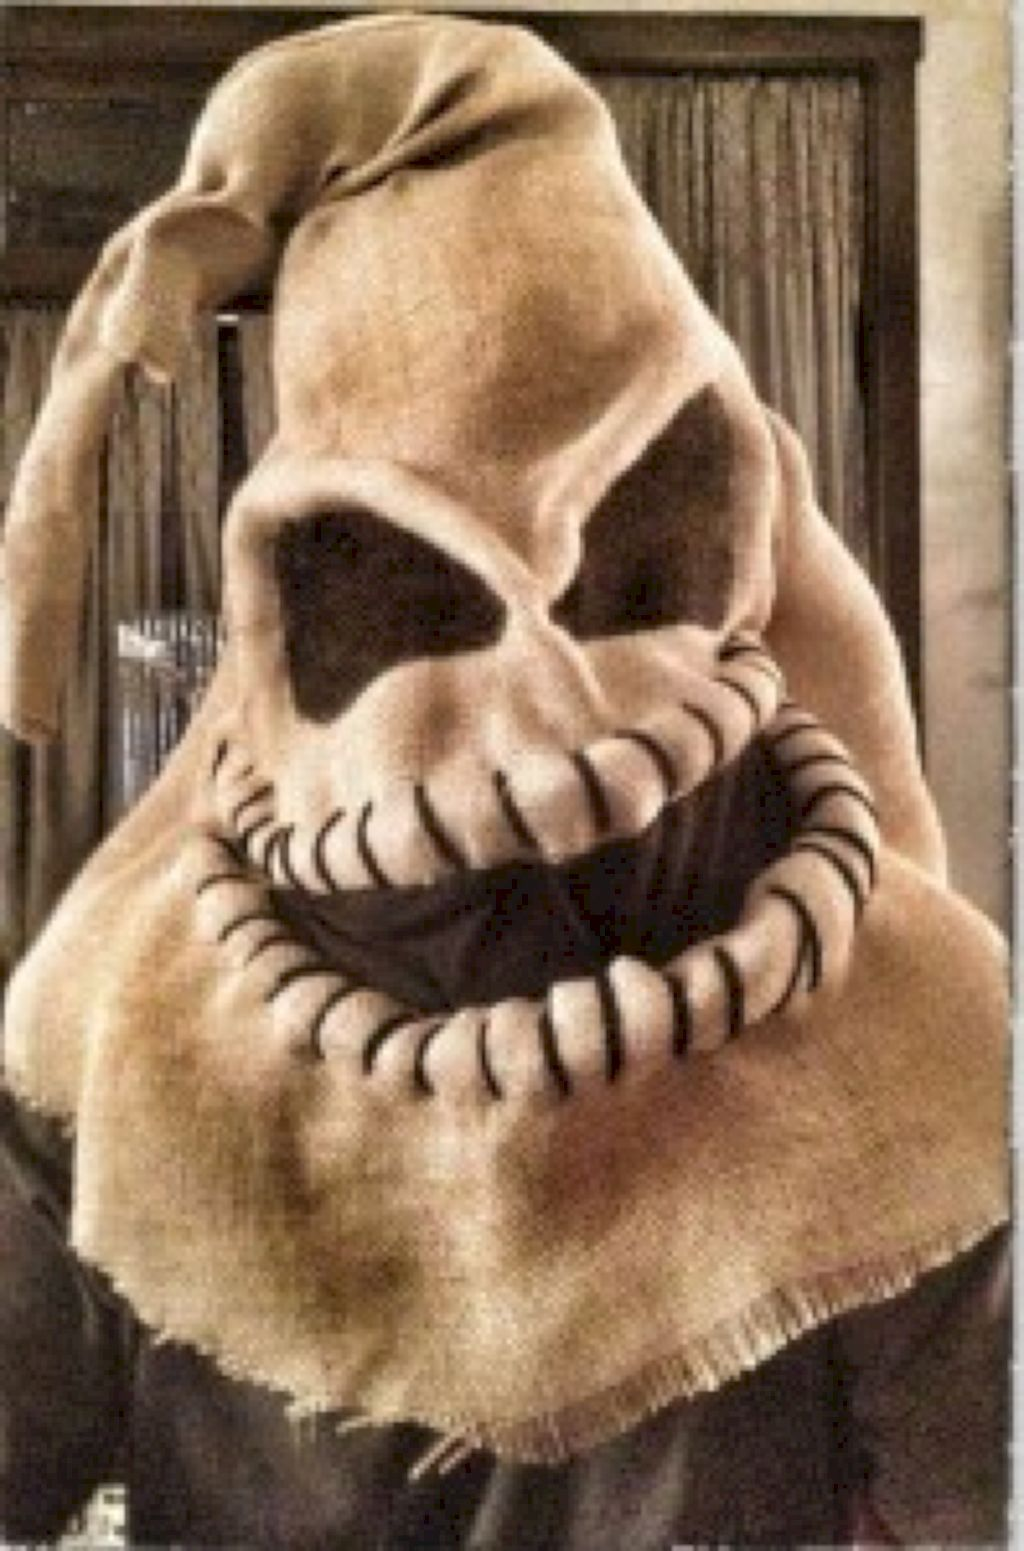 47 Easy Homemade Halloween Decor Ideas Homemade halloween and Holidays - scary halloween decor